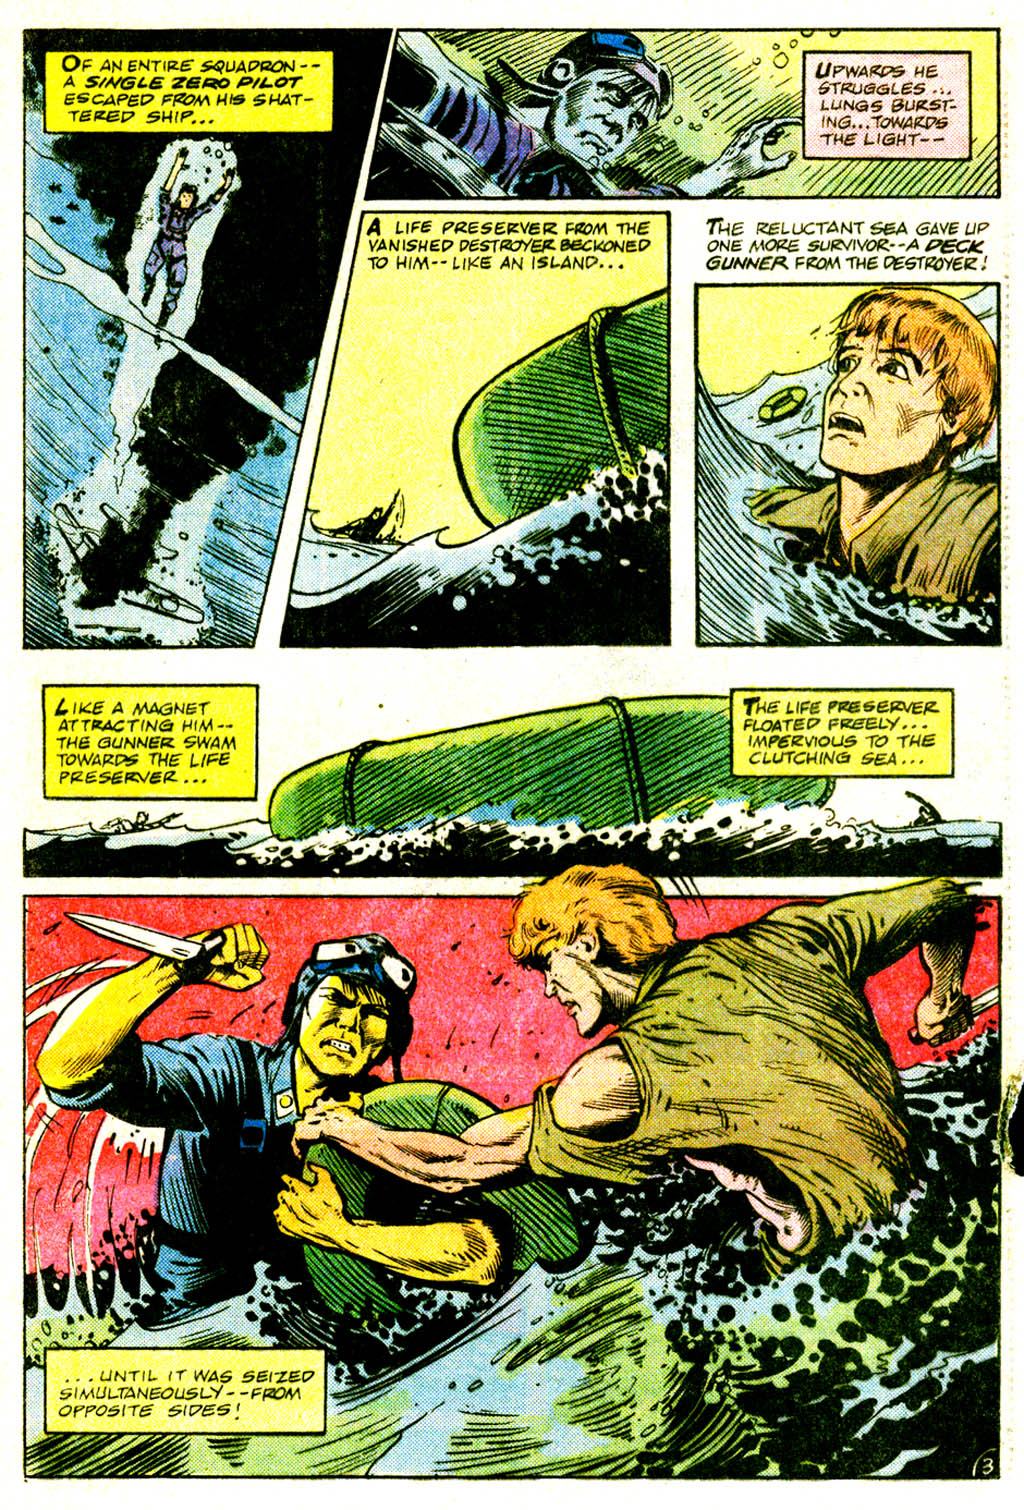 Read online Sgt. Rock comic -  Issue #362 - 20